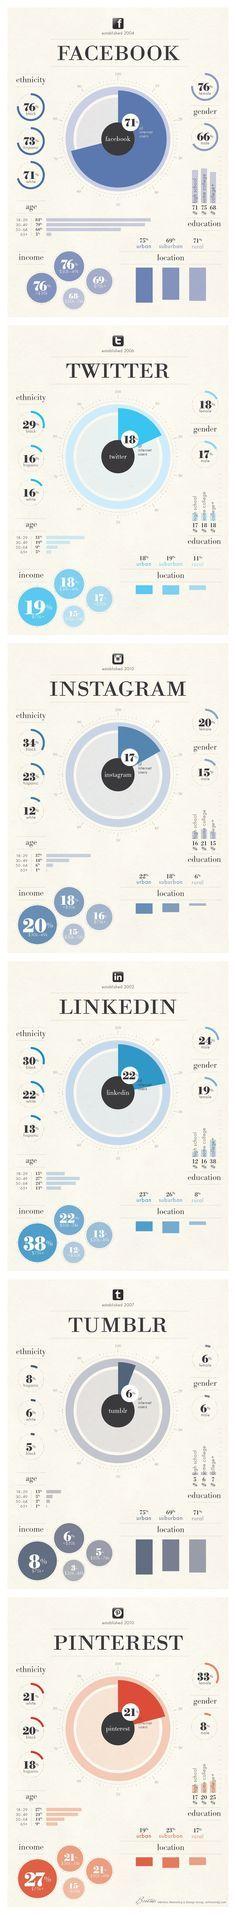 Social User Demographics via Angela LeBrun  For Facebook, Twitter, Instagram, LinkedIn, Tumblr and #Pinterest - #infographic